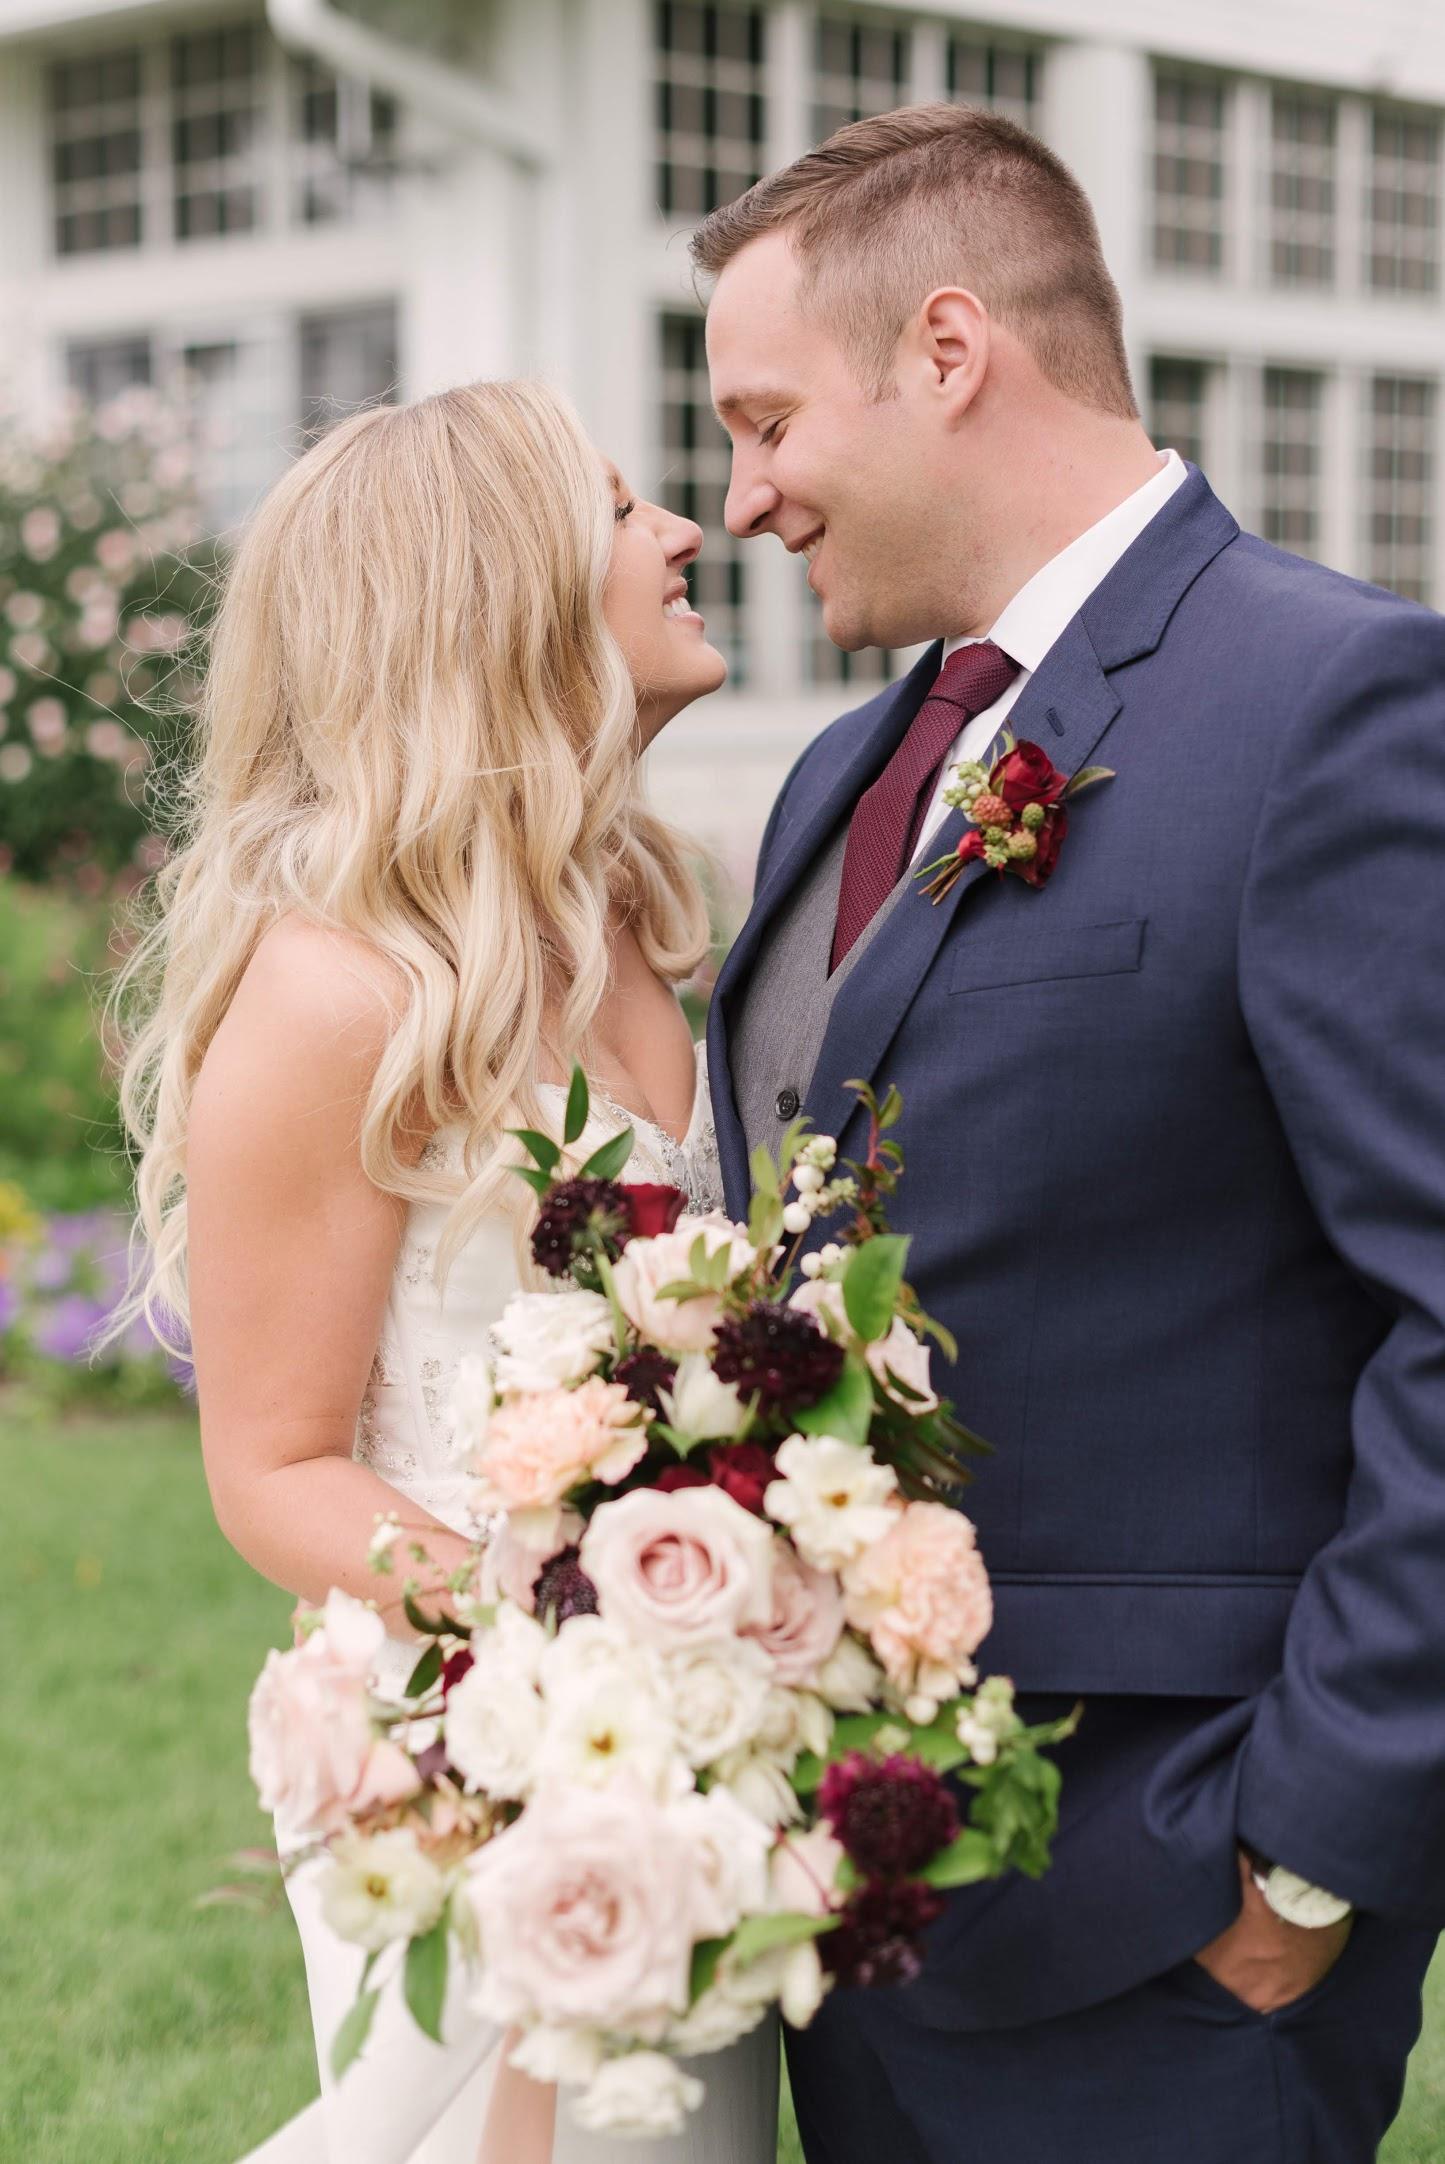 Field-Gems-Photography-Detroit-Michigan-Wedding-Photographer-Family-Photographer-Photobooth-090818-519.jpg